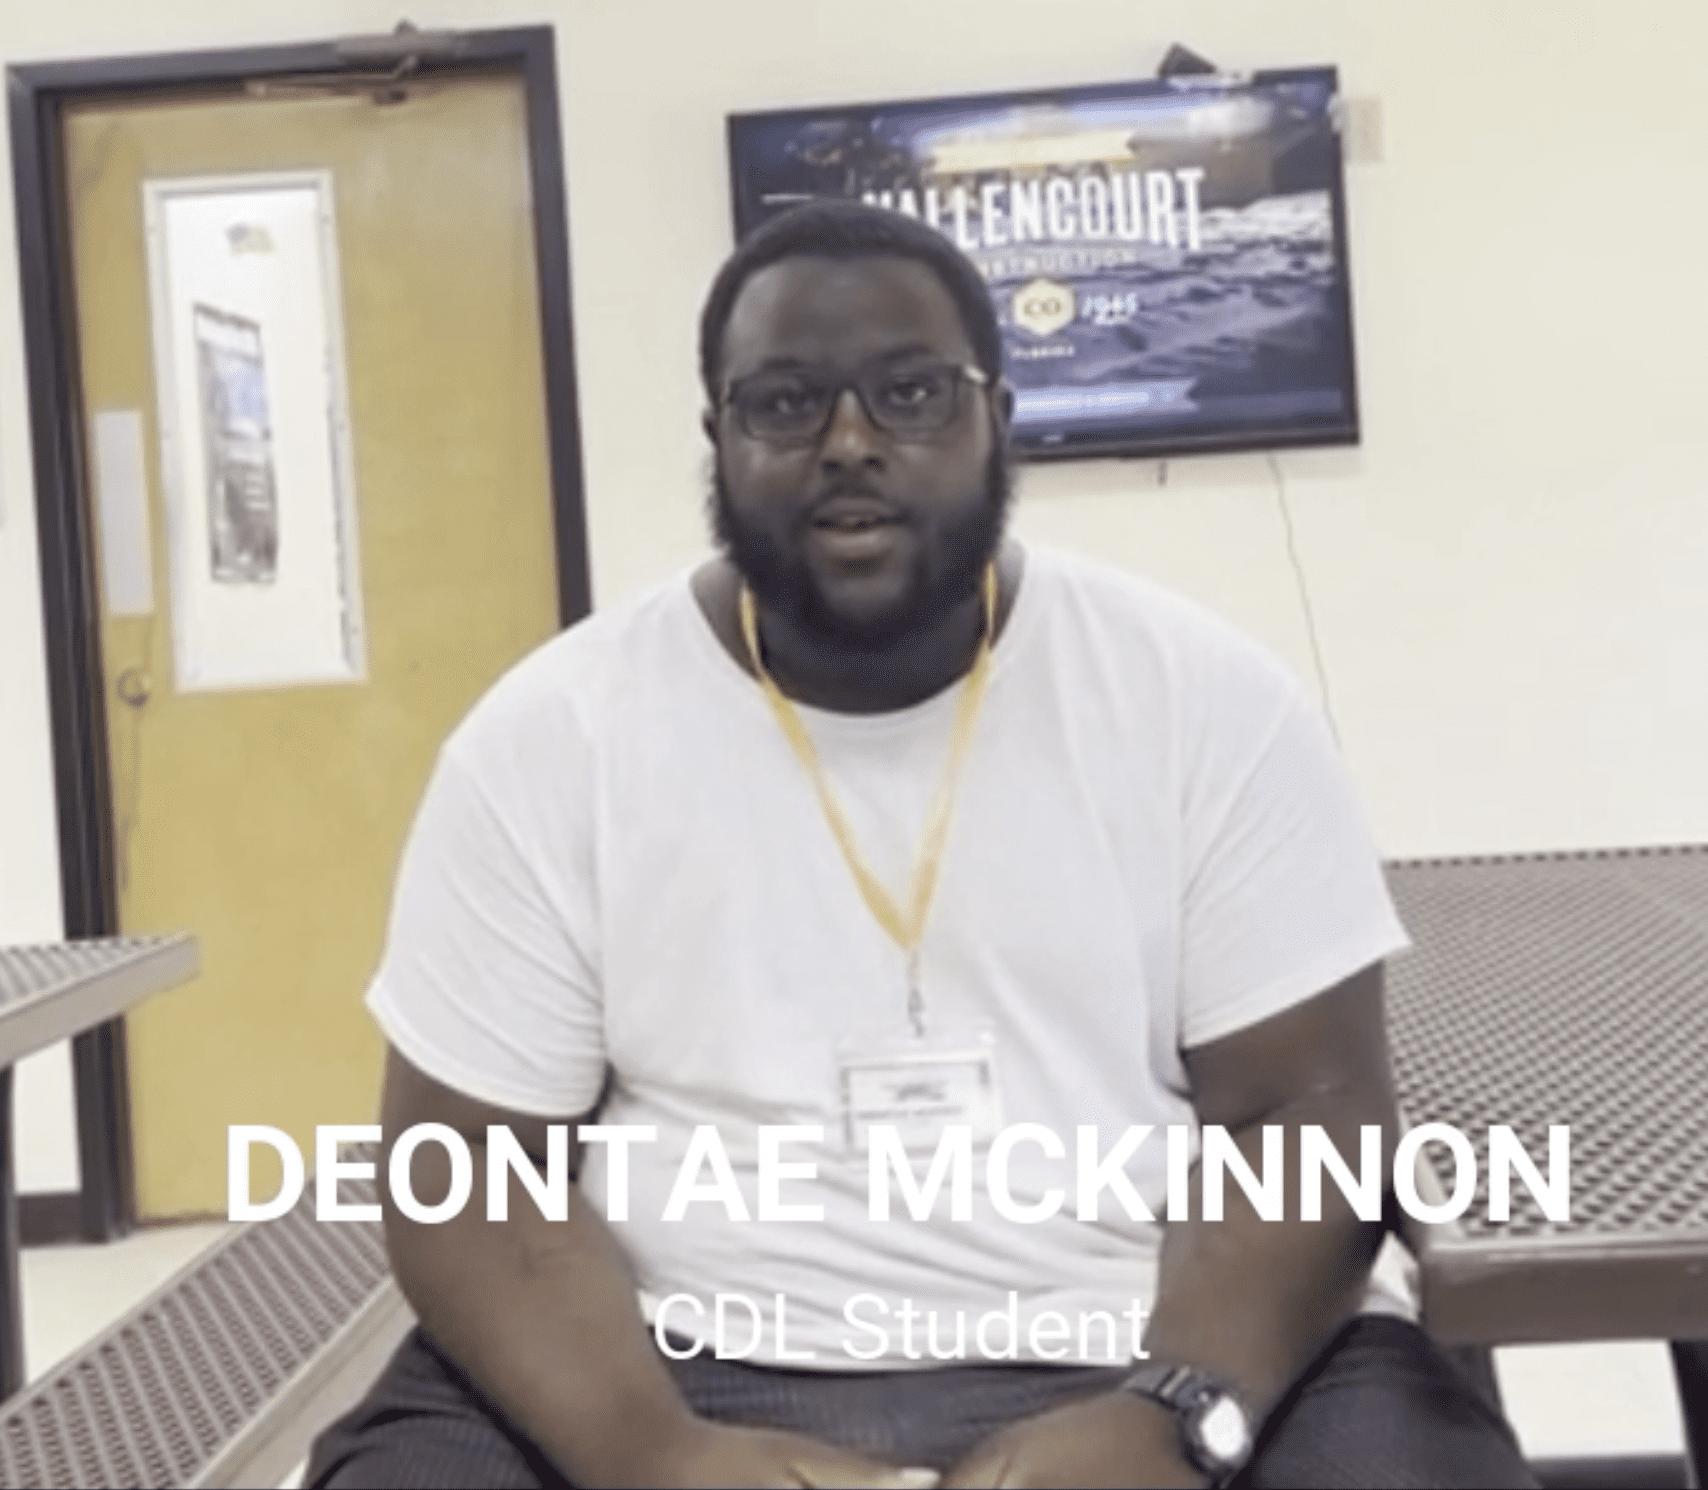 Graduate Deontae Mckinnon